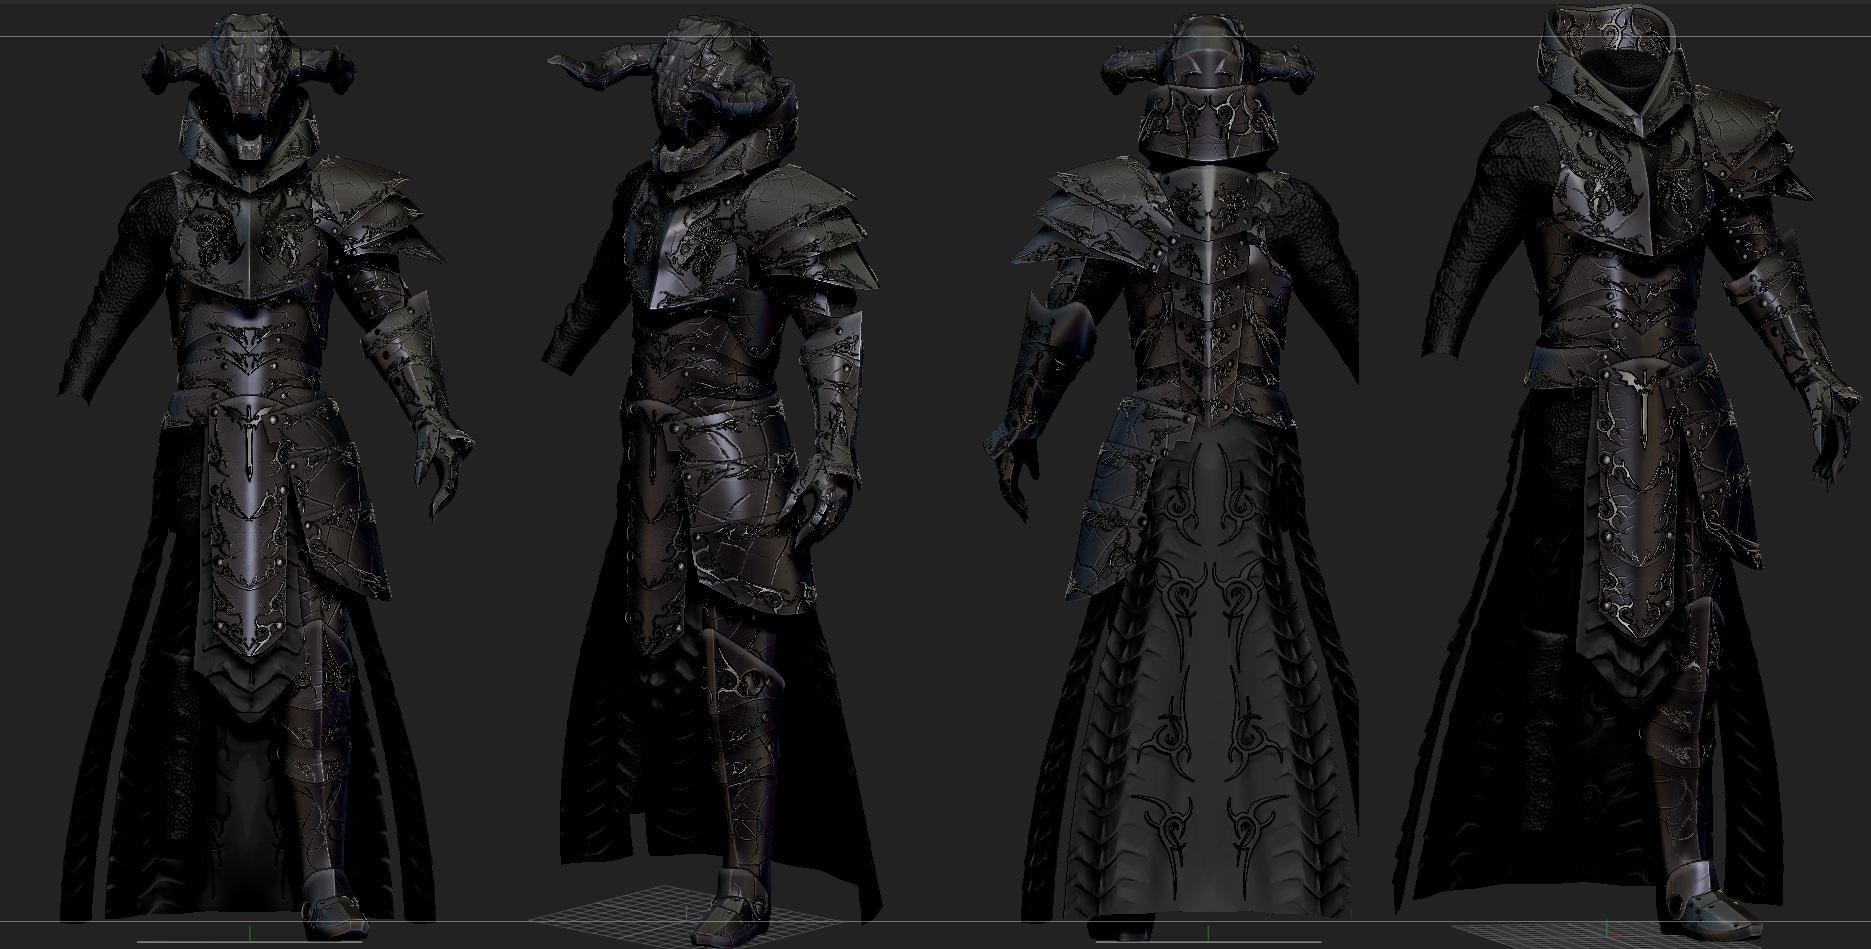 DRAGONLORD Skyrim custom armor by Zerofrust